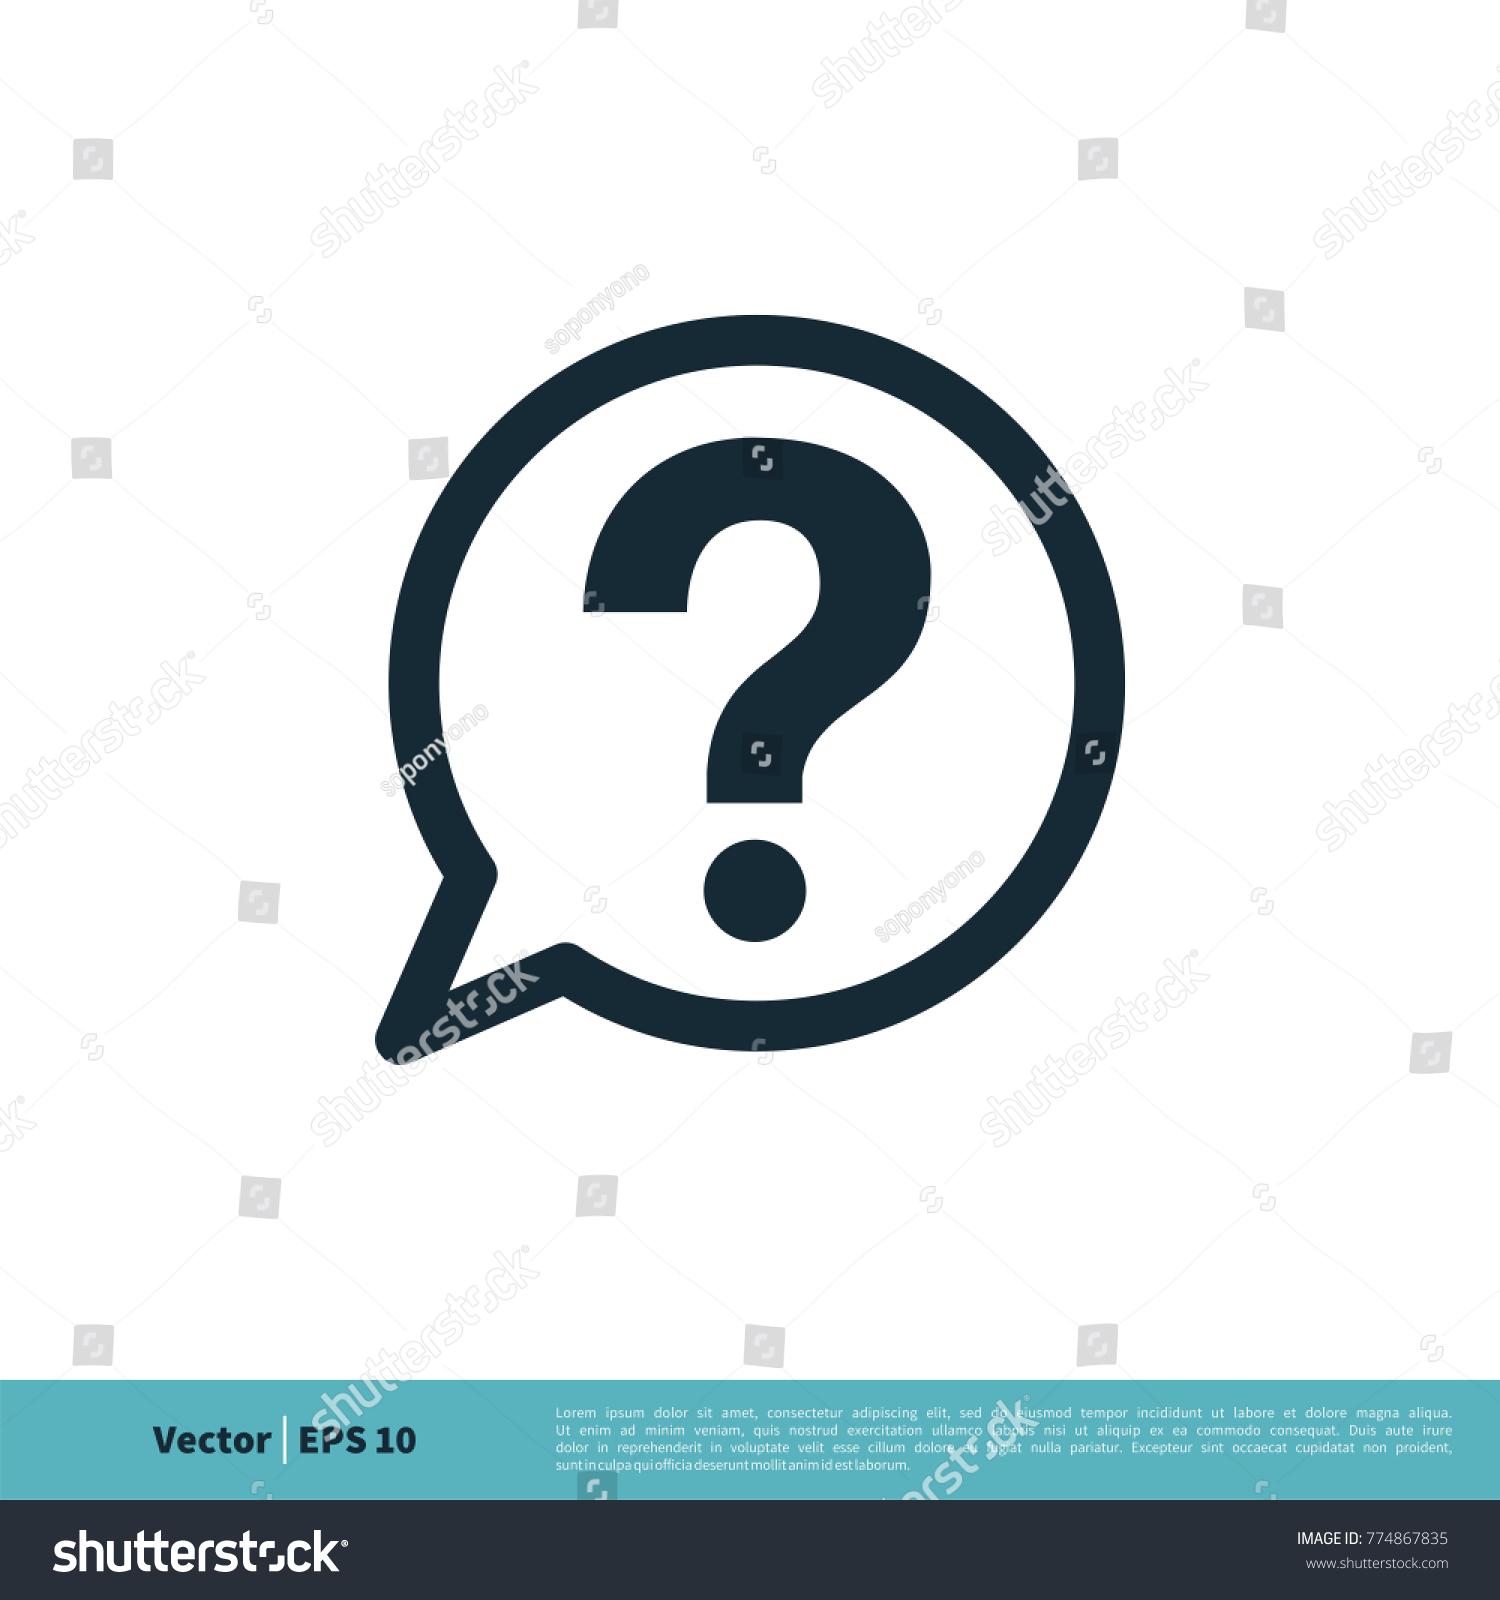 help sign icon vector logo template のベクター画像素材